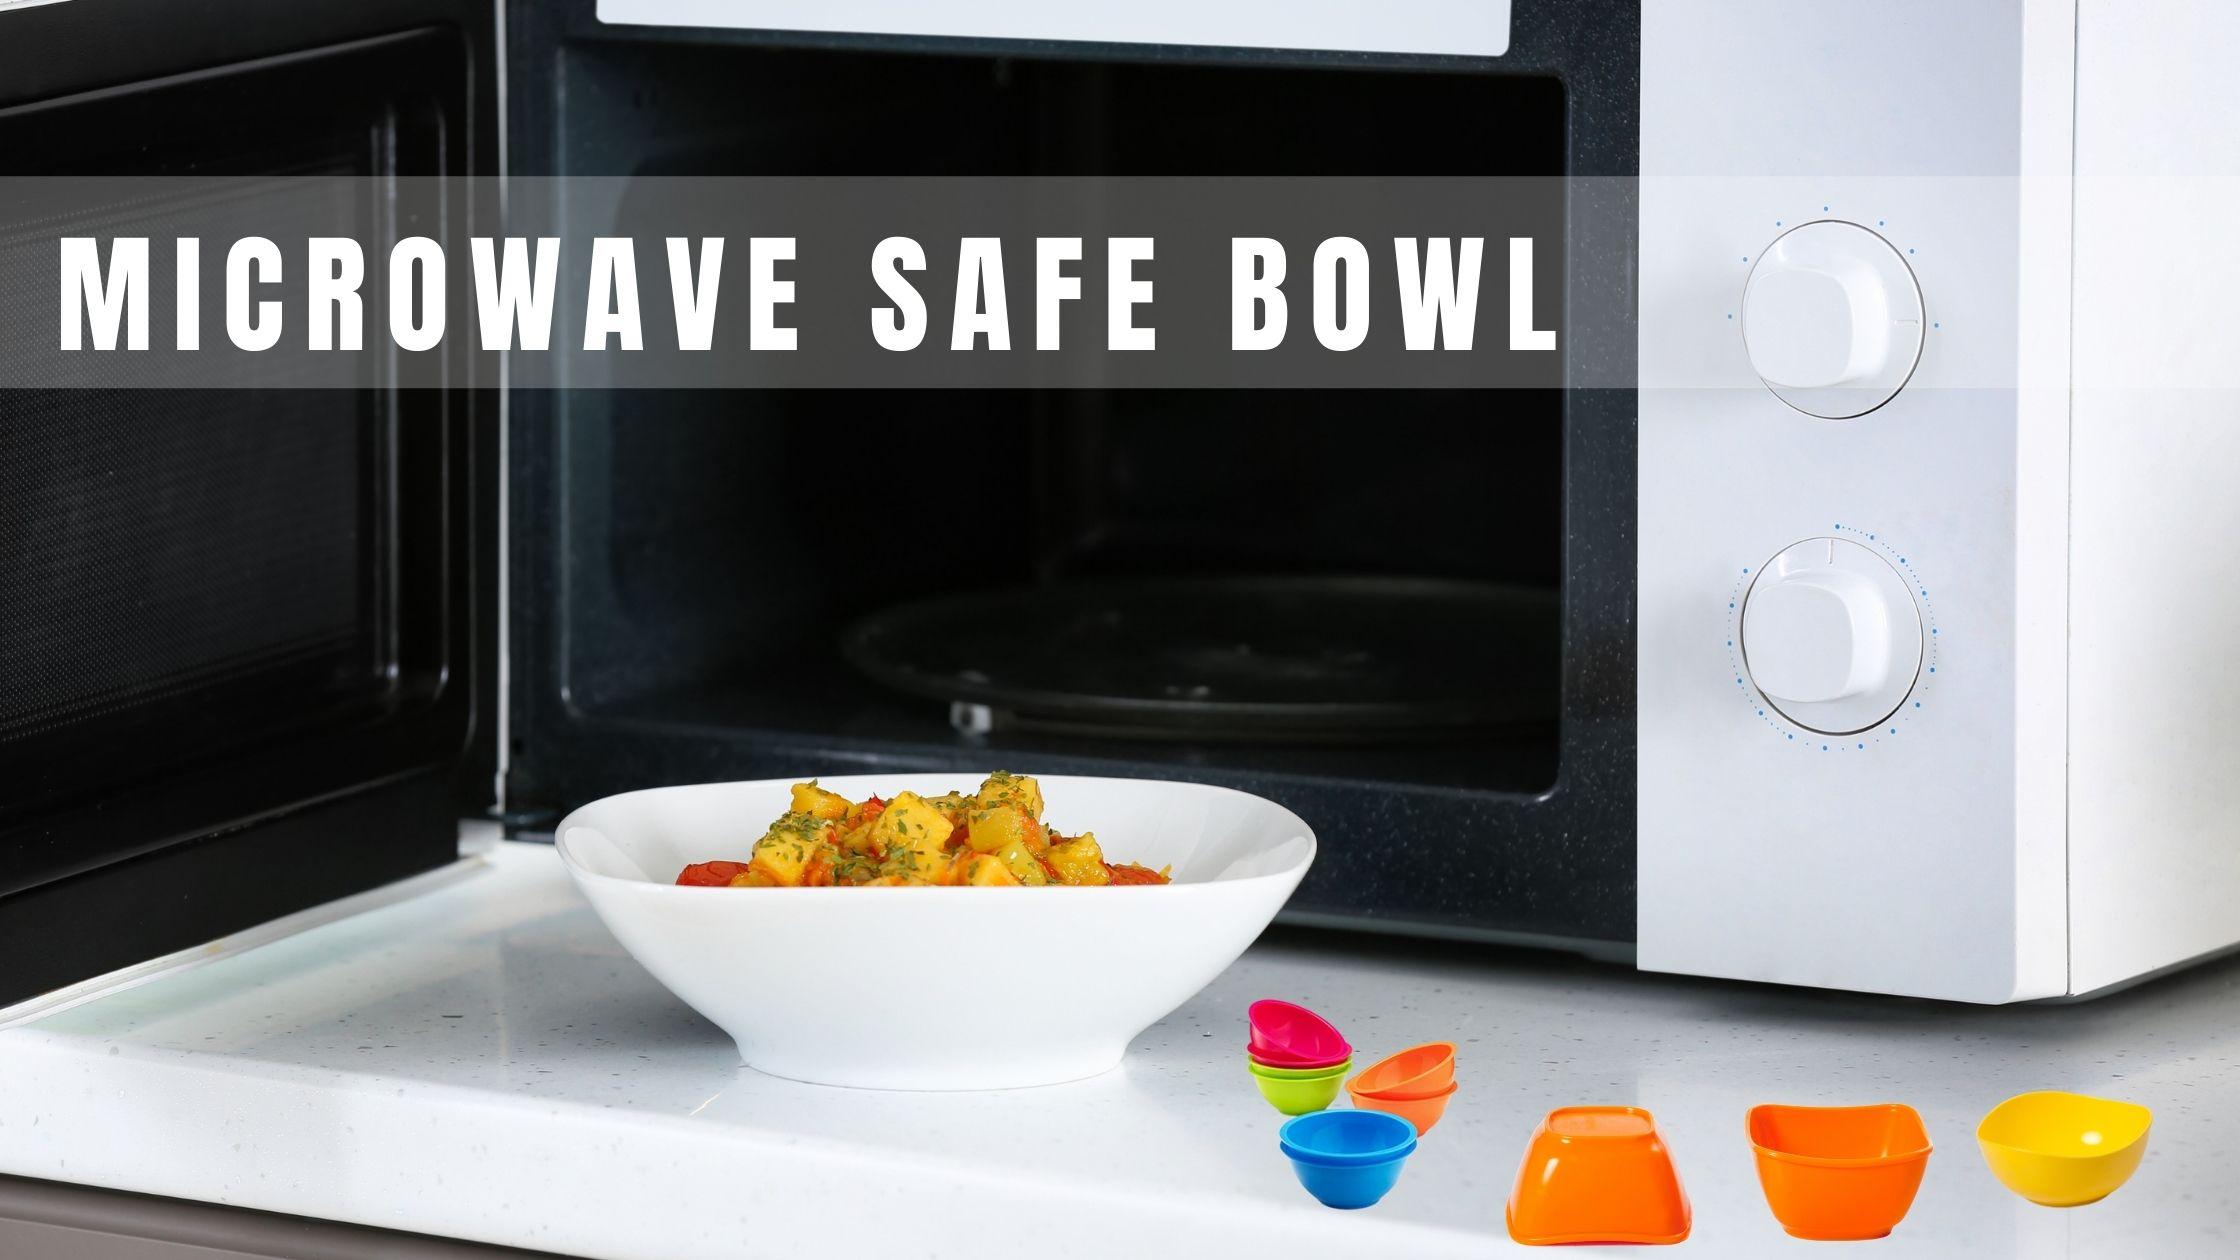 Microwave Safe Bowl